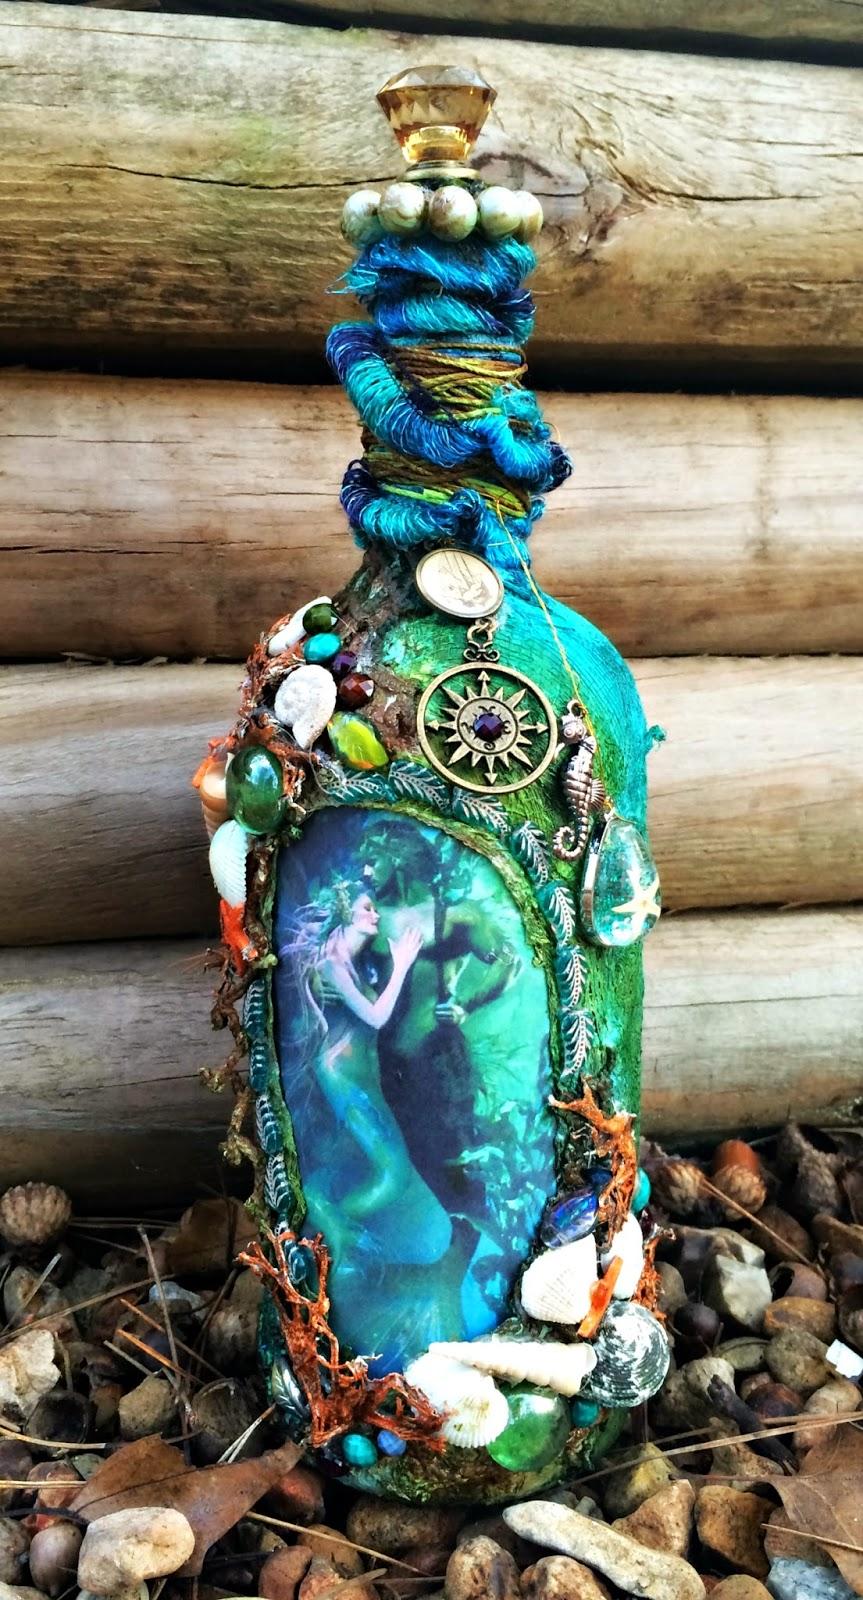 Mermaid Altered Bottle | Art Anthology